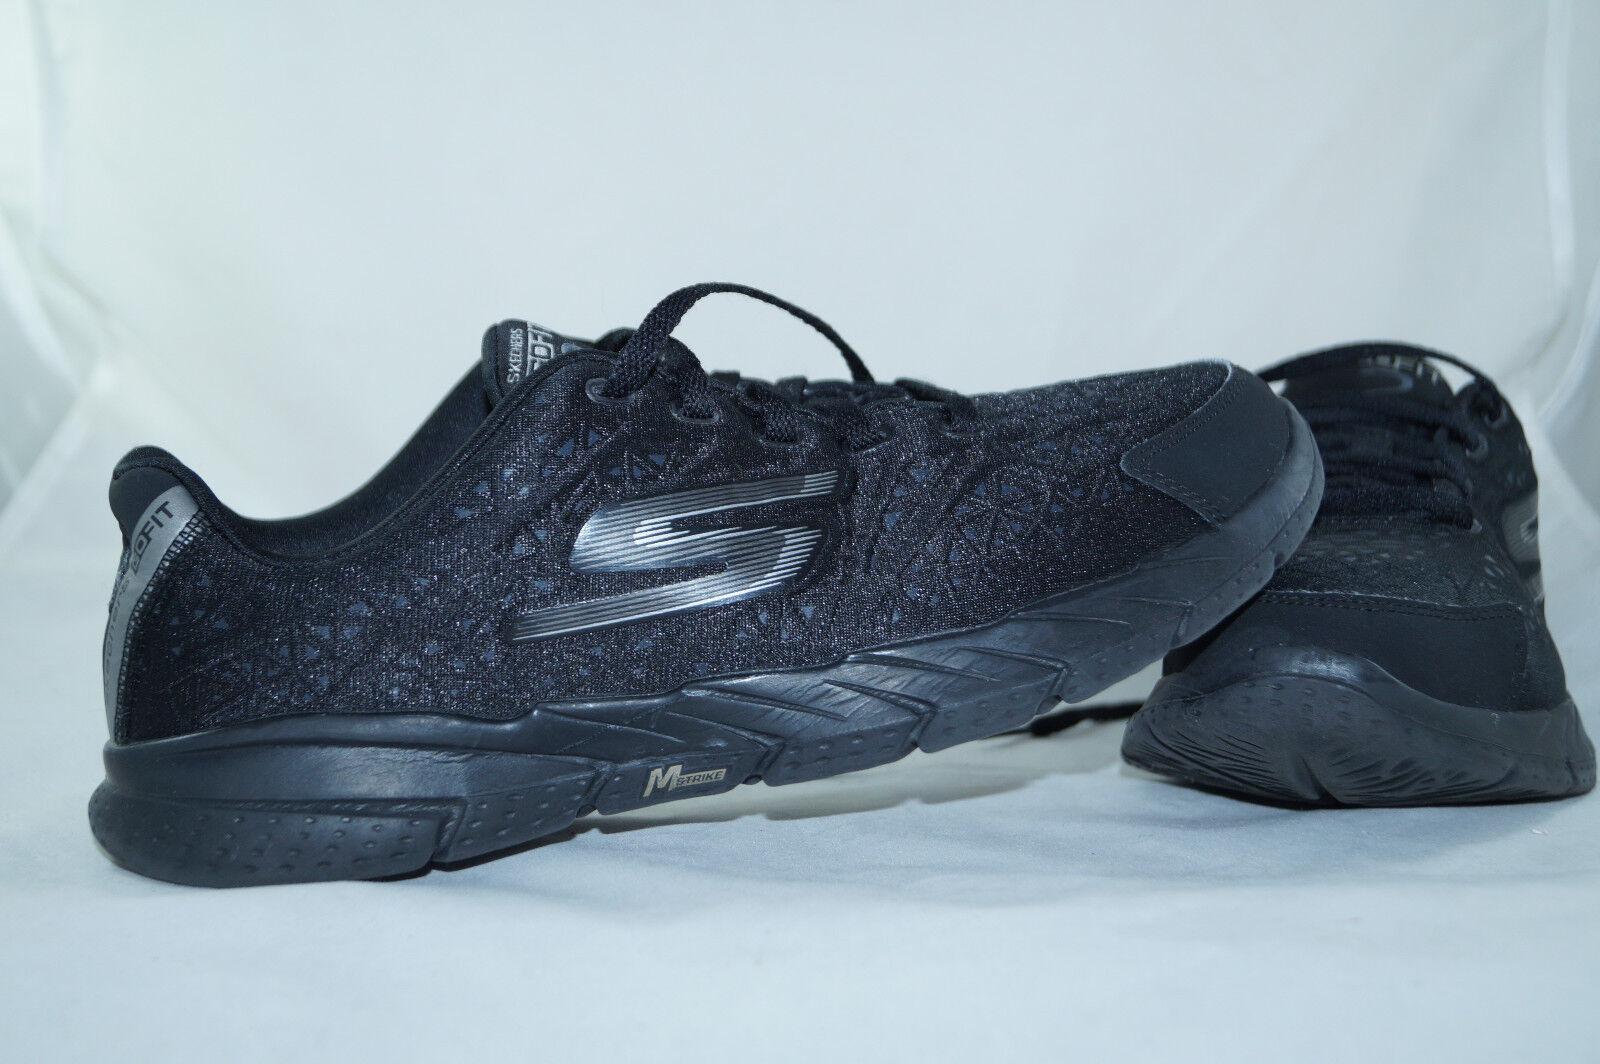 Skechers Gofit 2 Memory Form Fit Gr  37,5 black Laufschuhe Sportschuhe